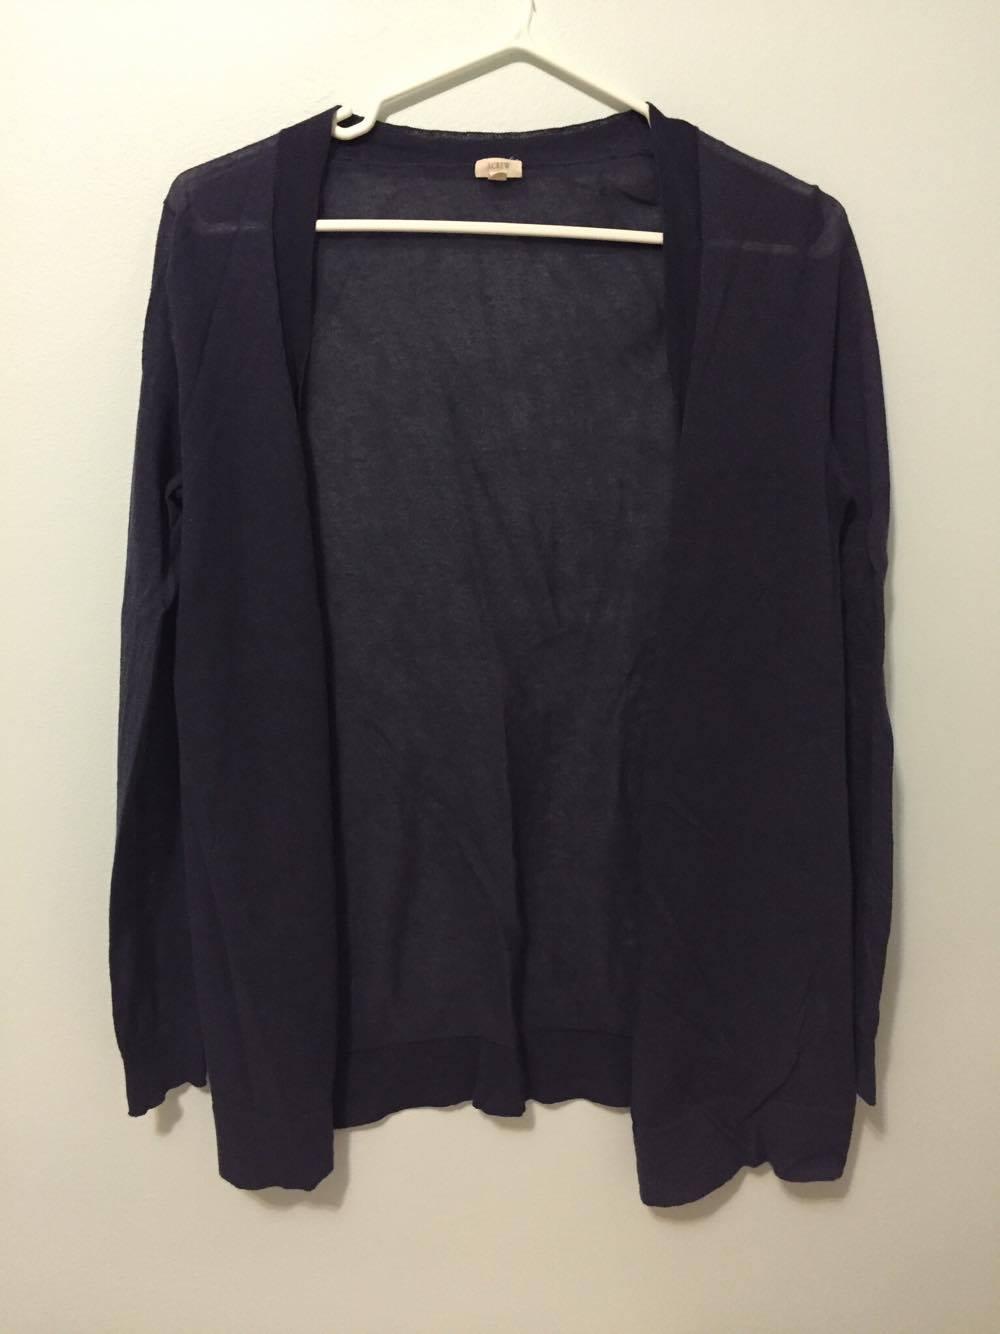 JCrew dark blue/purple cardigan